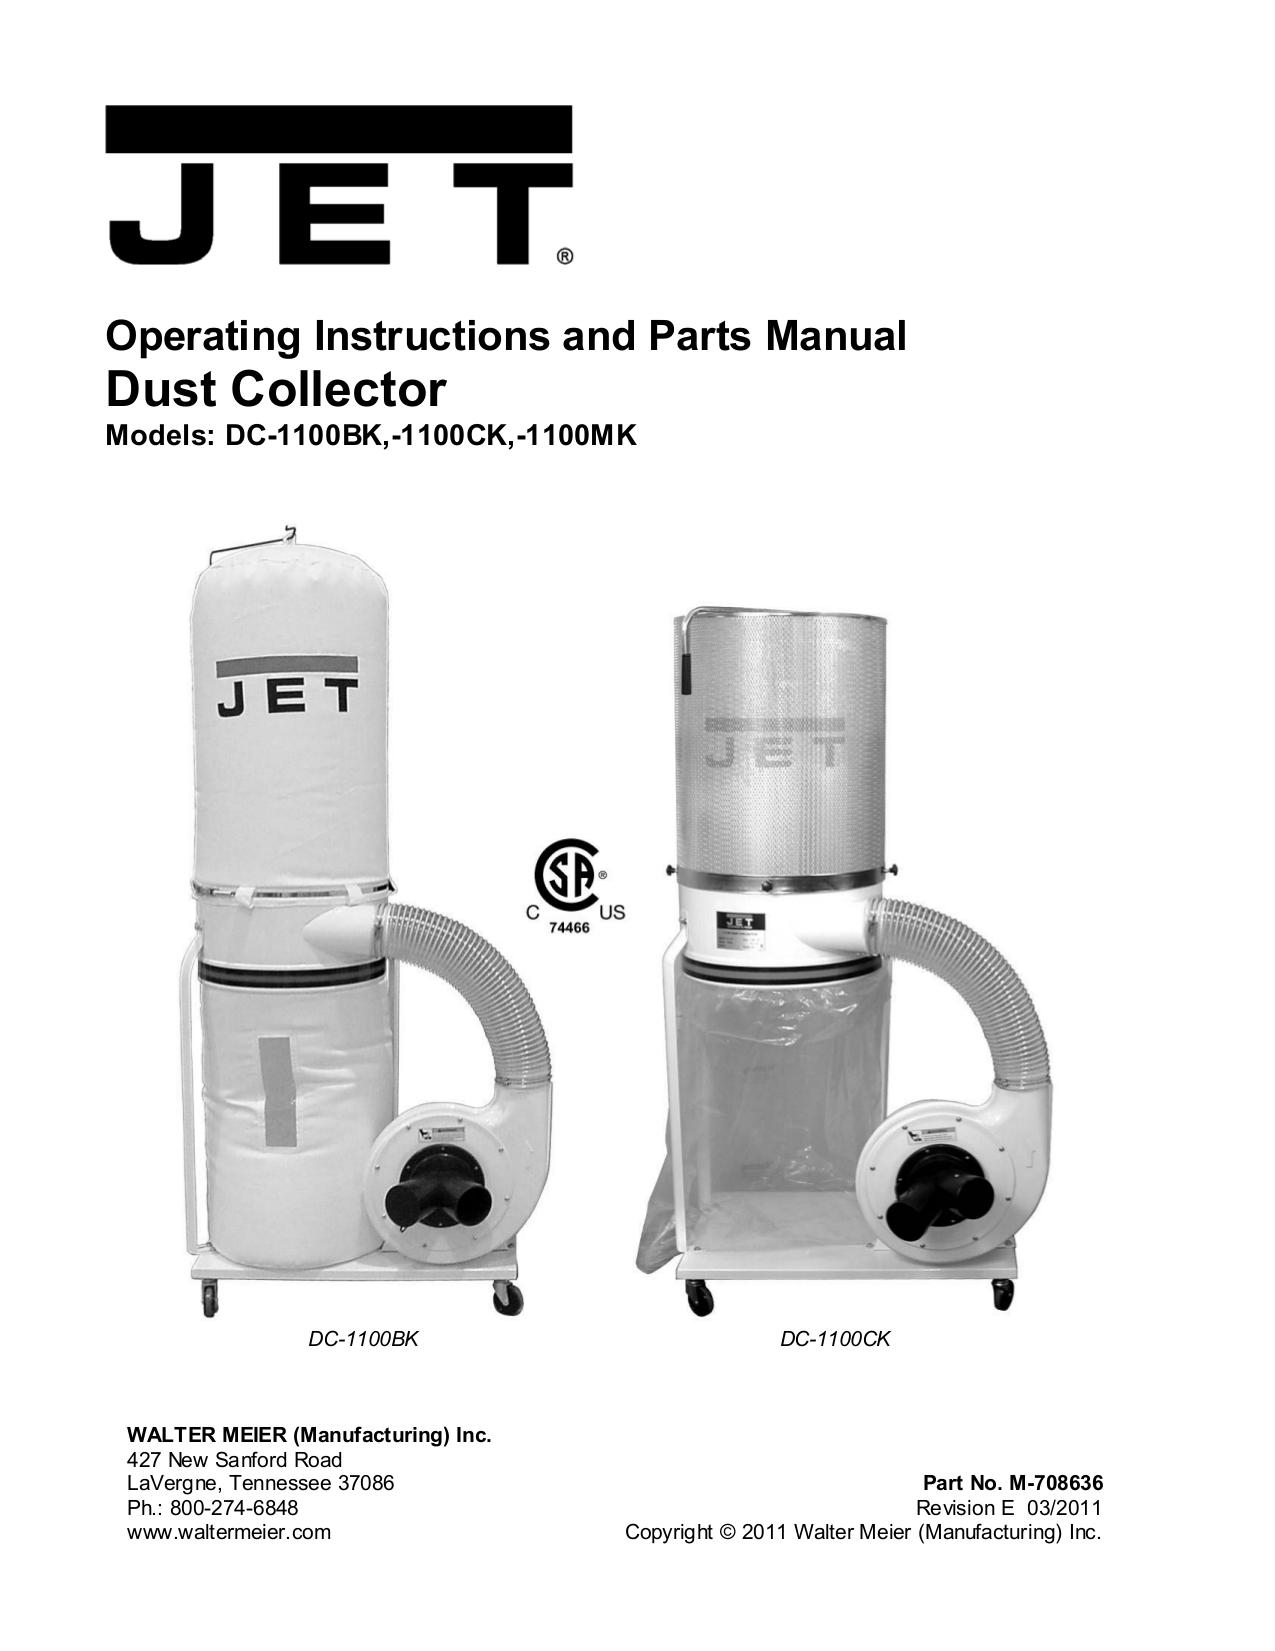 pdf for Jet Vacuum DC-1100C manual